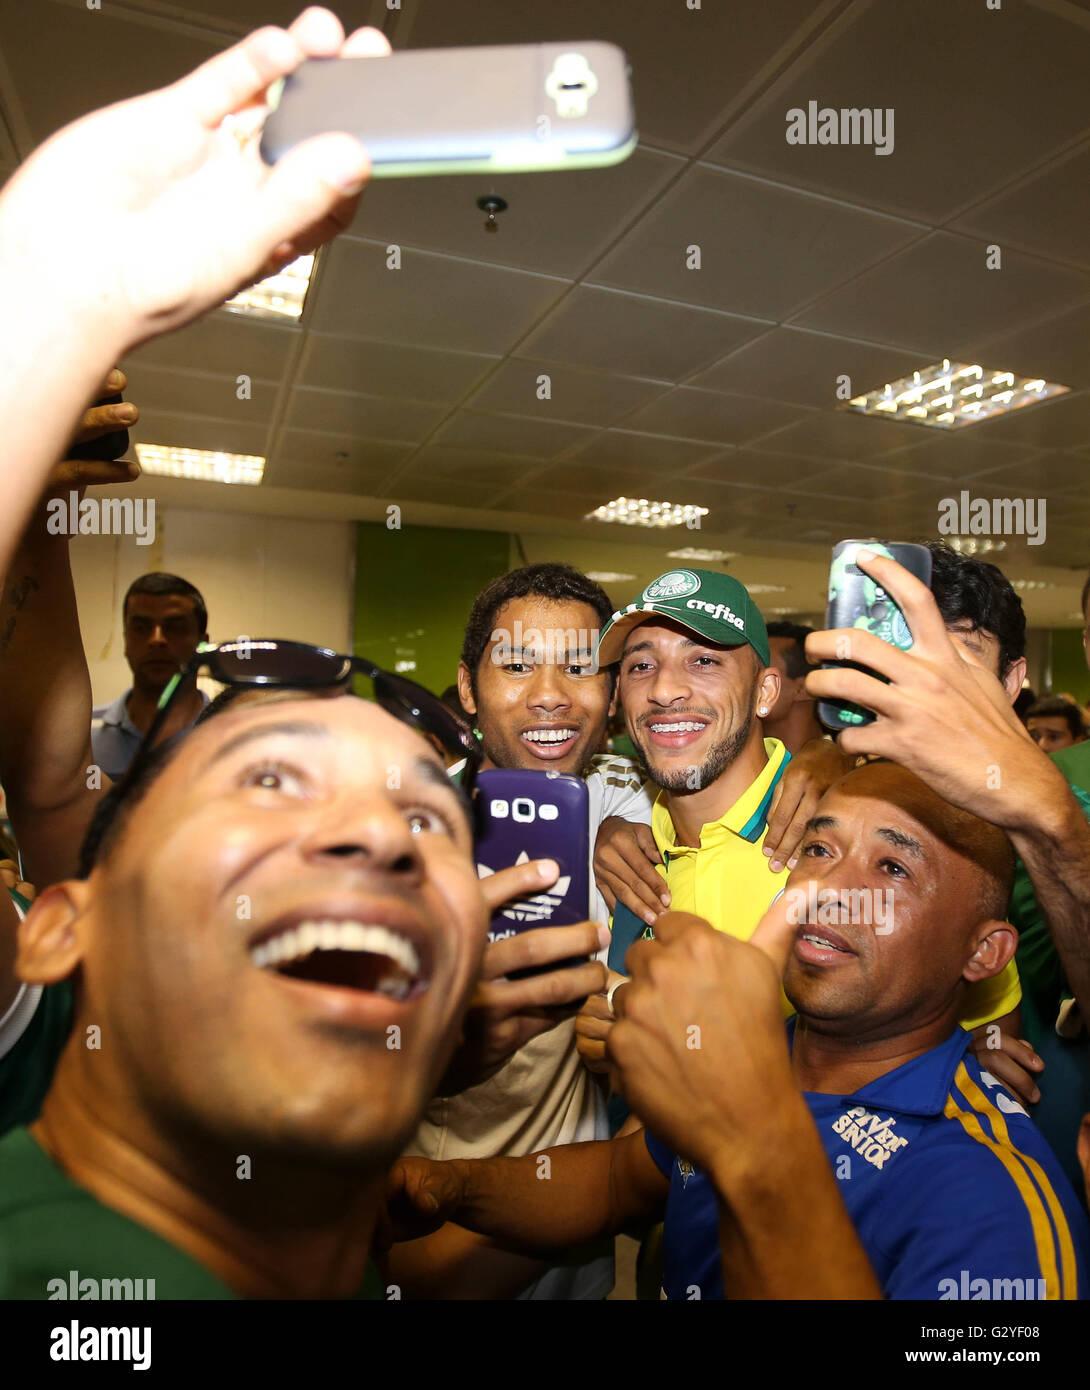 BRASI??LIA, DF - 06/04/2016: LANDING OF PALM TREES - The player Vitor Hugo, the SE Palmeiras during landing at the - Stock Image